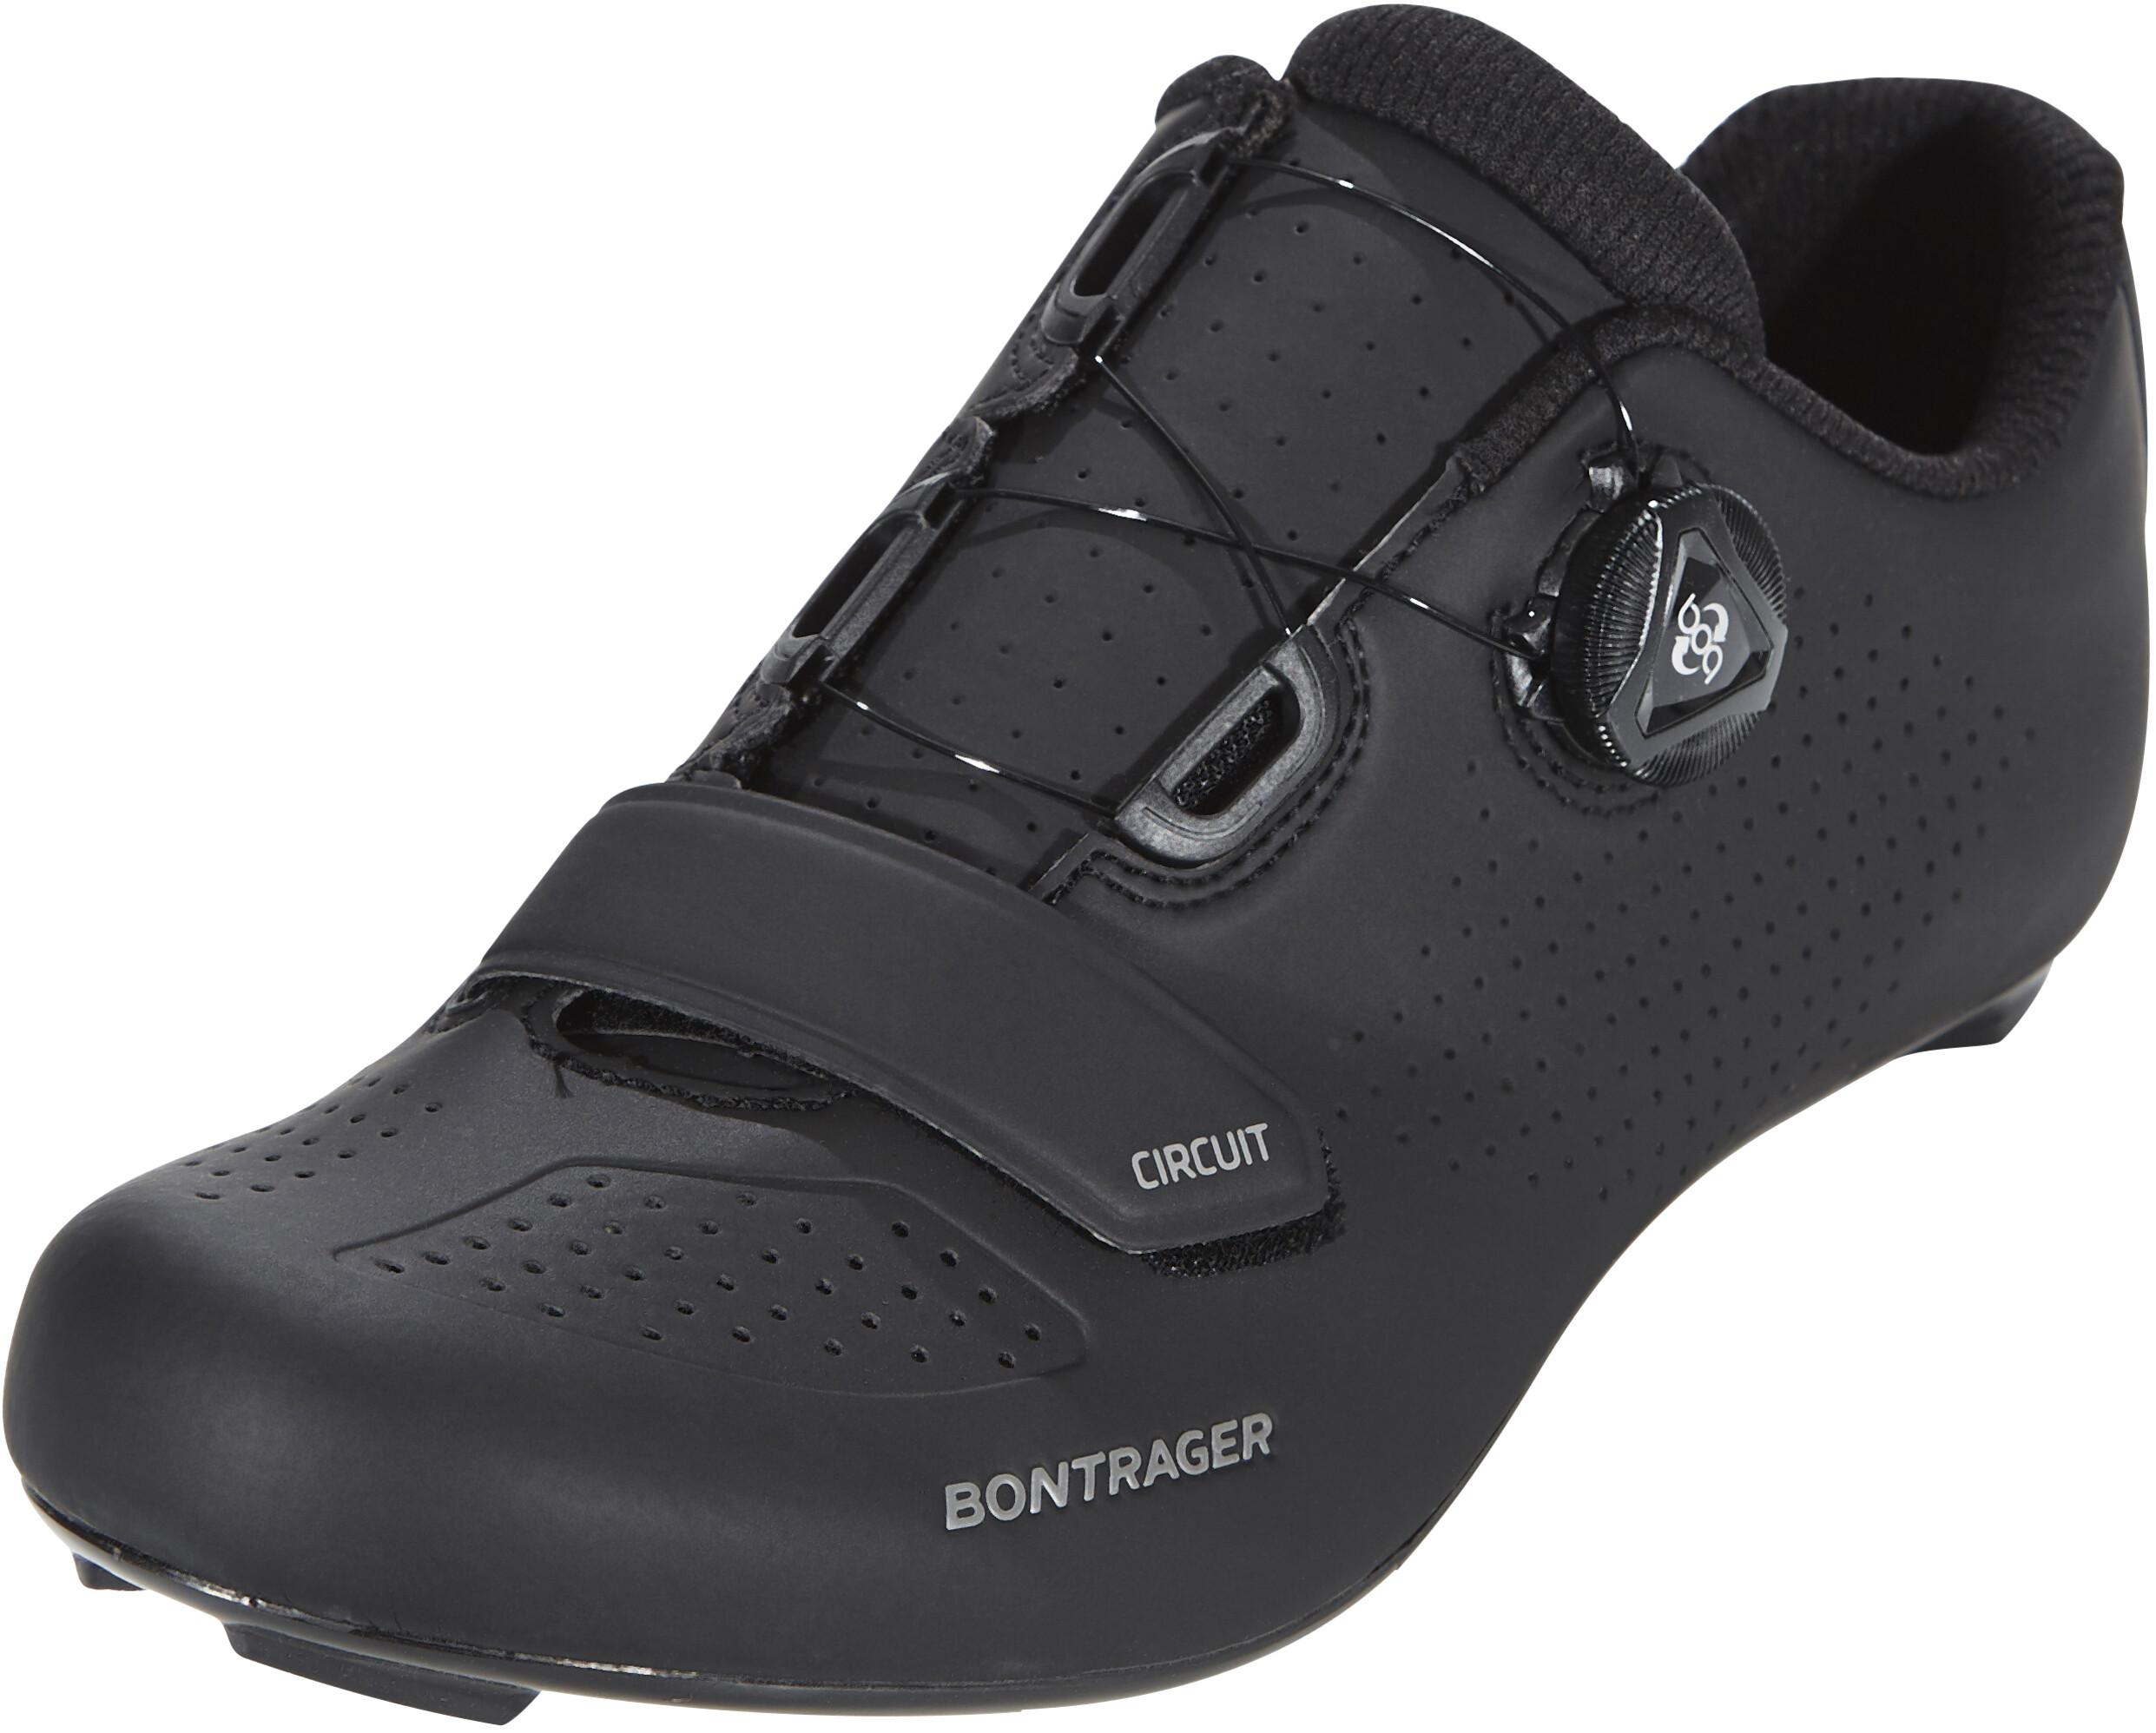 best sneakers cbd49 5805d Bontrager Circuit - Zapatillas Hombre - negro